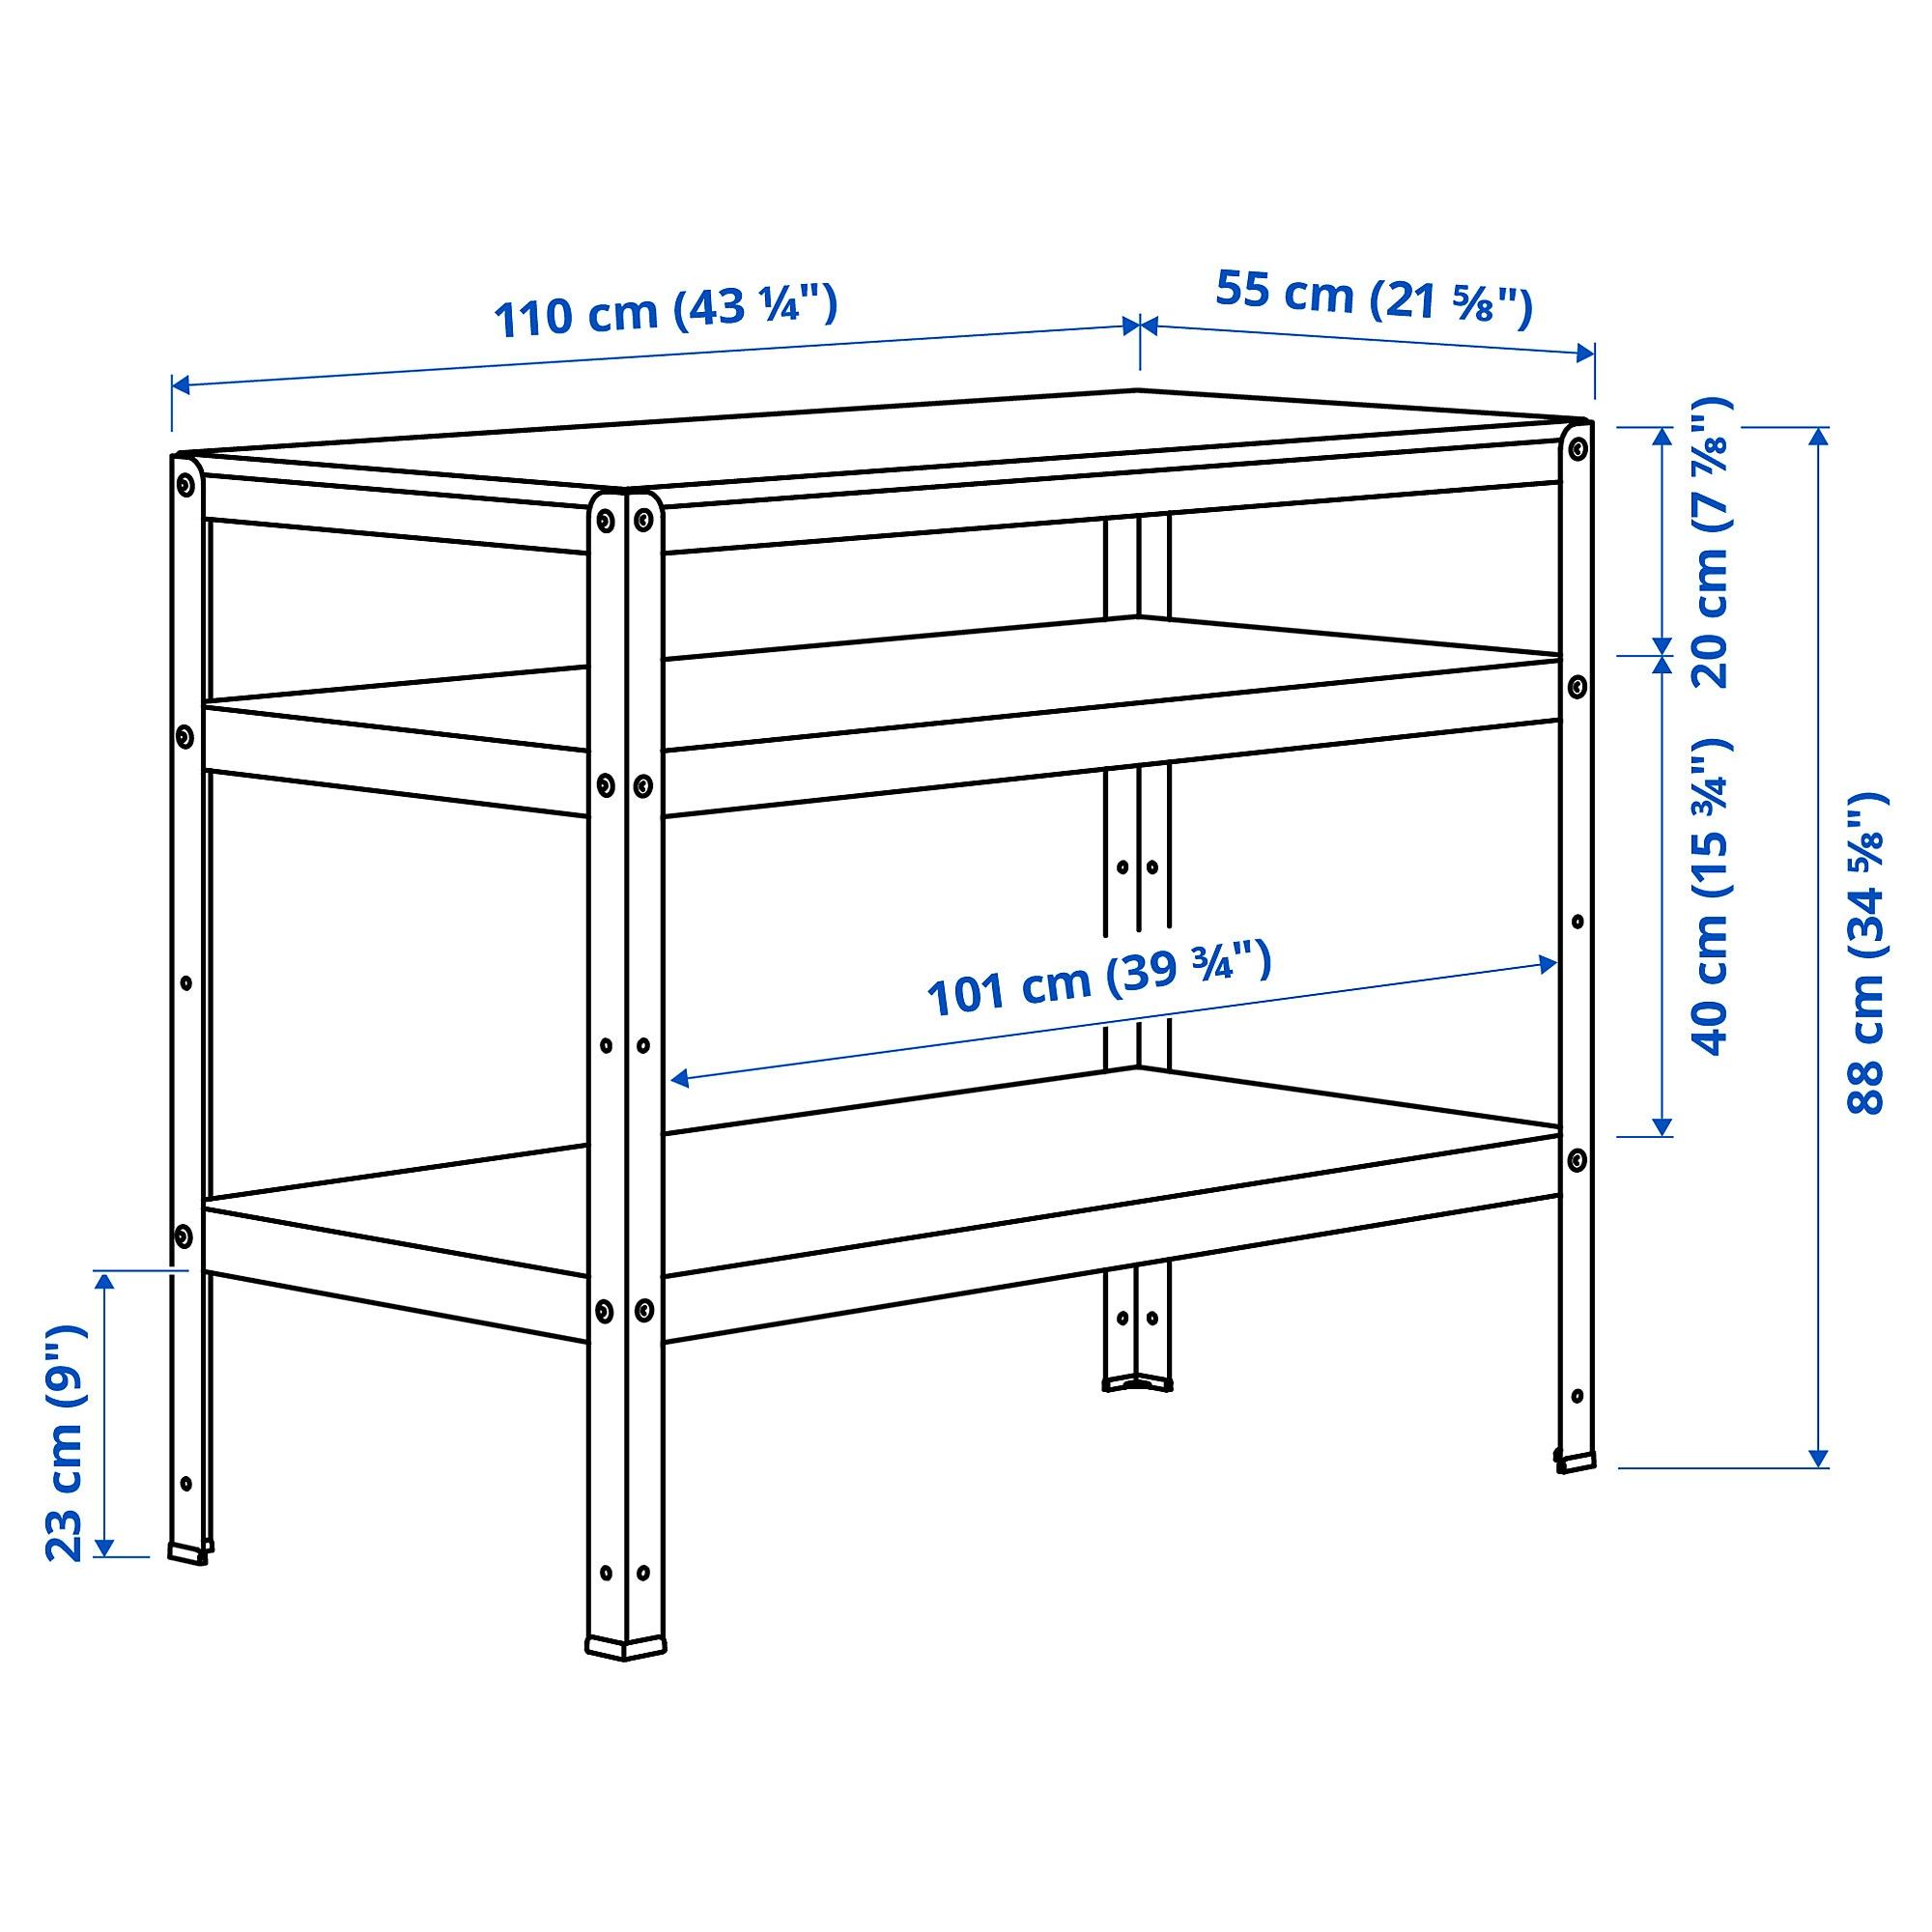 BROR Bord vit 110x55 cm